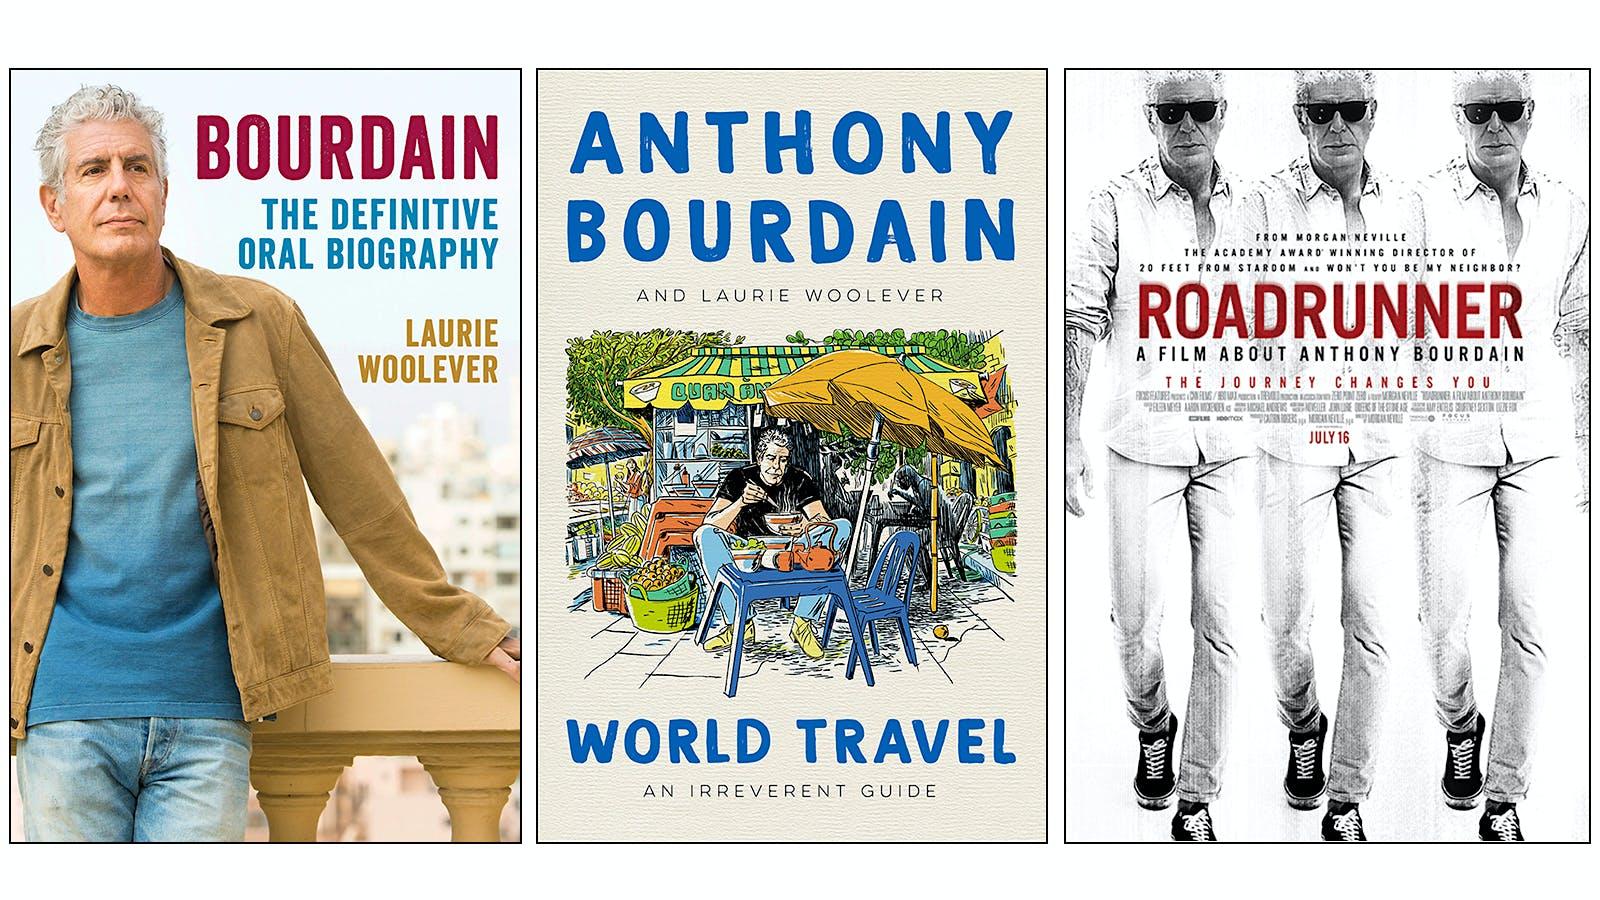 Celebrating Anthony Bourdain